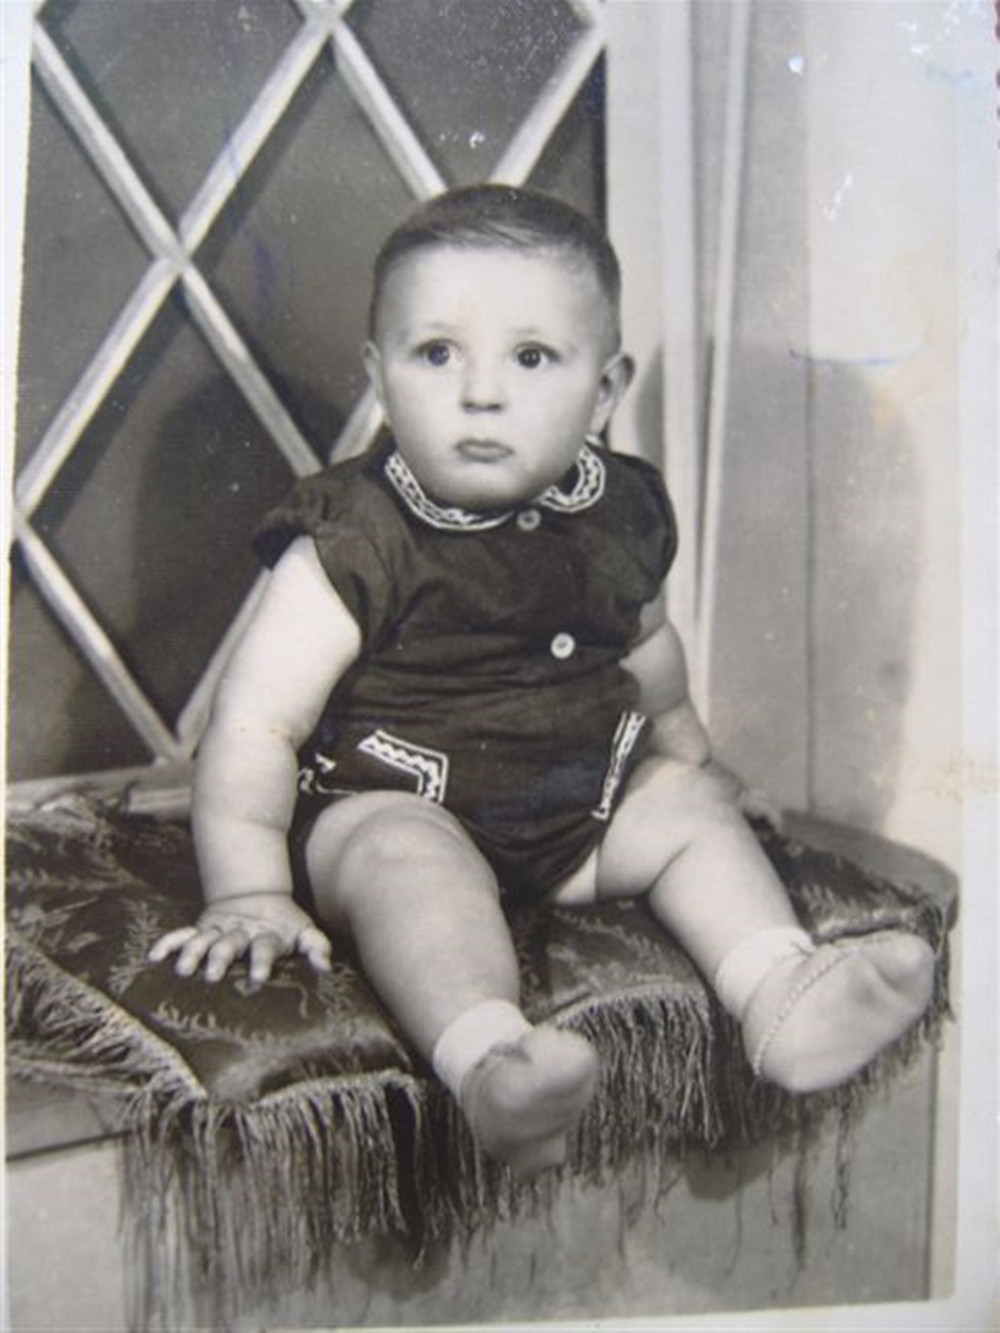 Meu pai com 8 meses de vida.